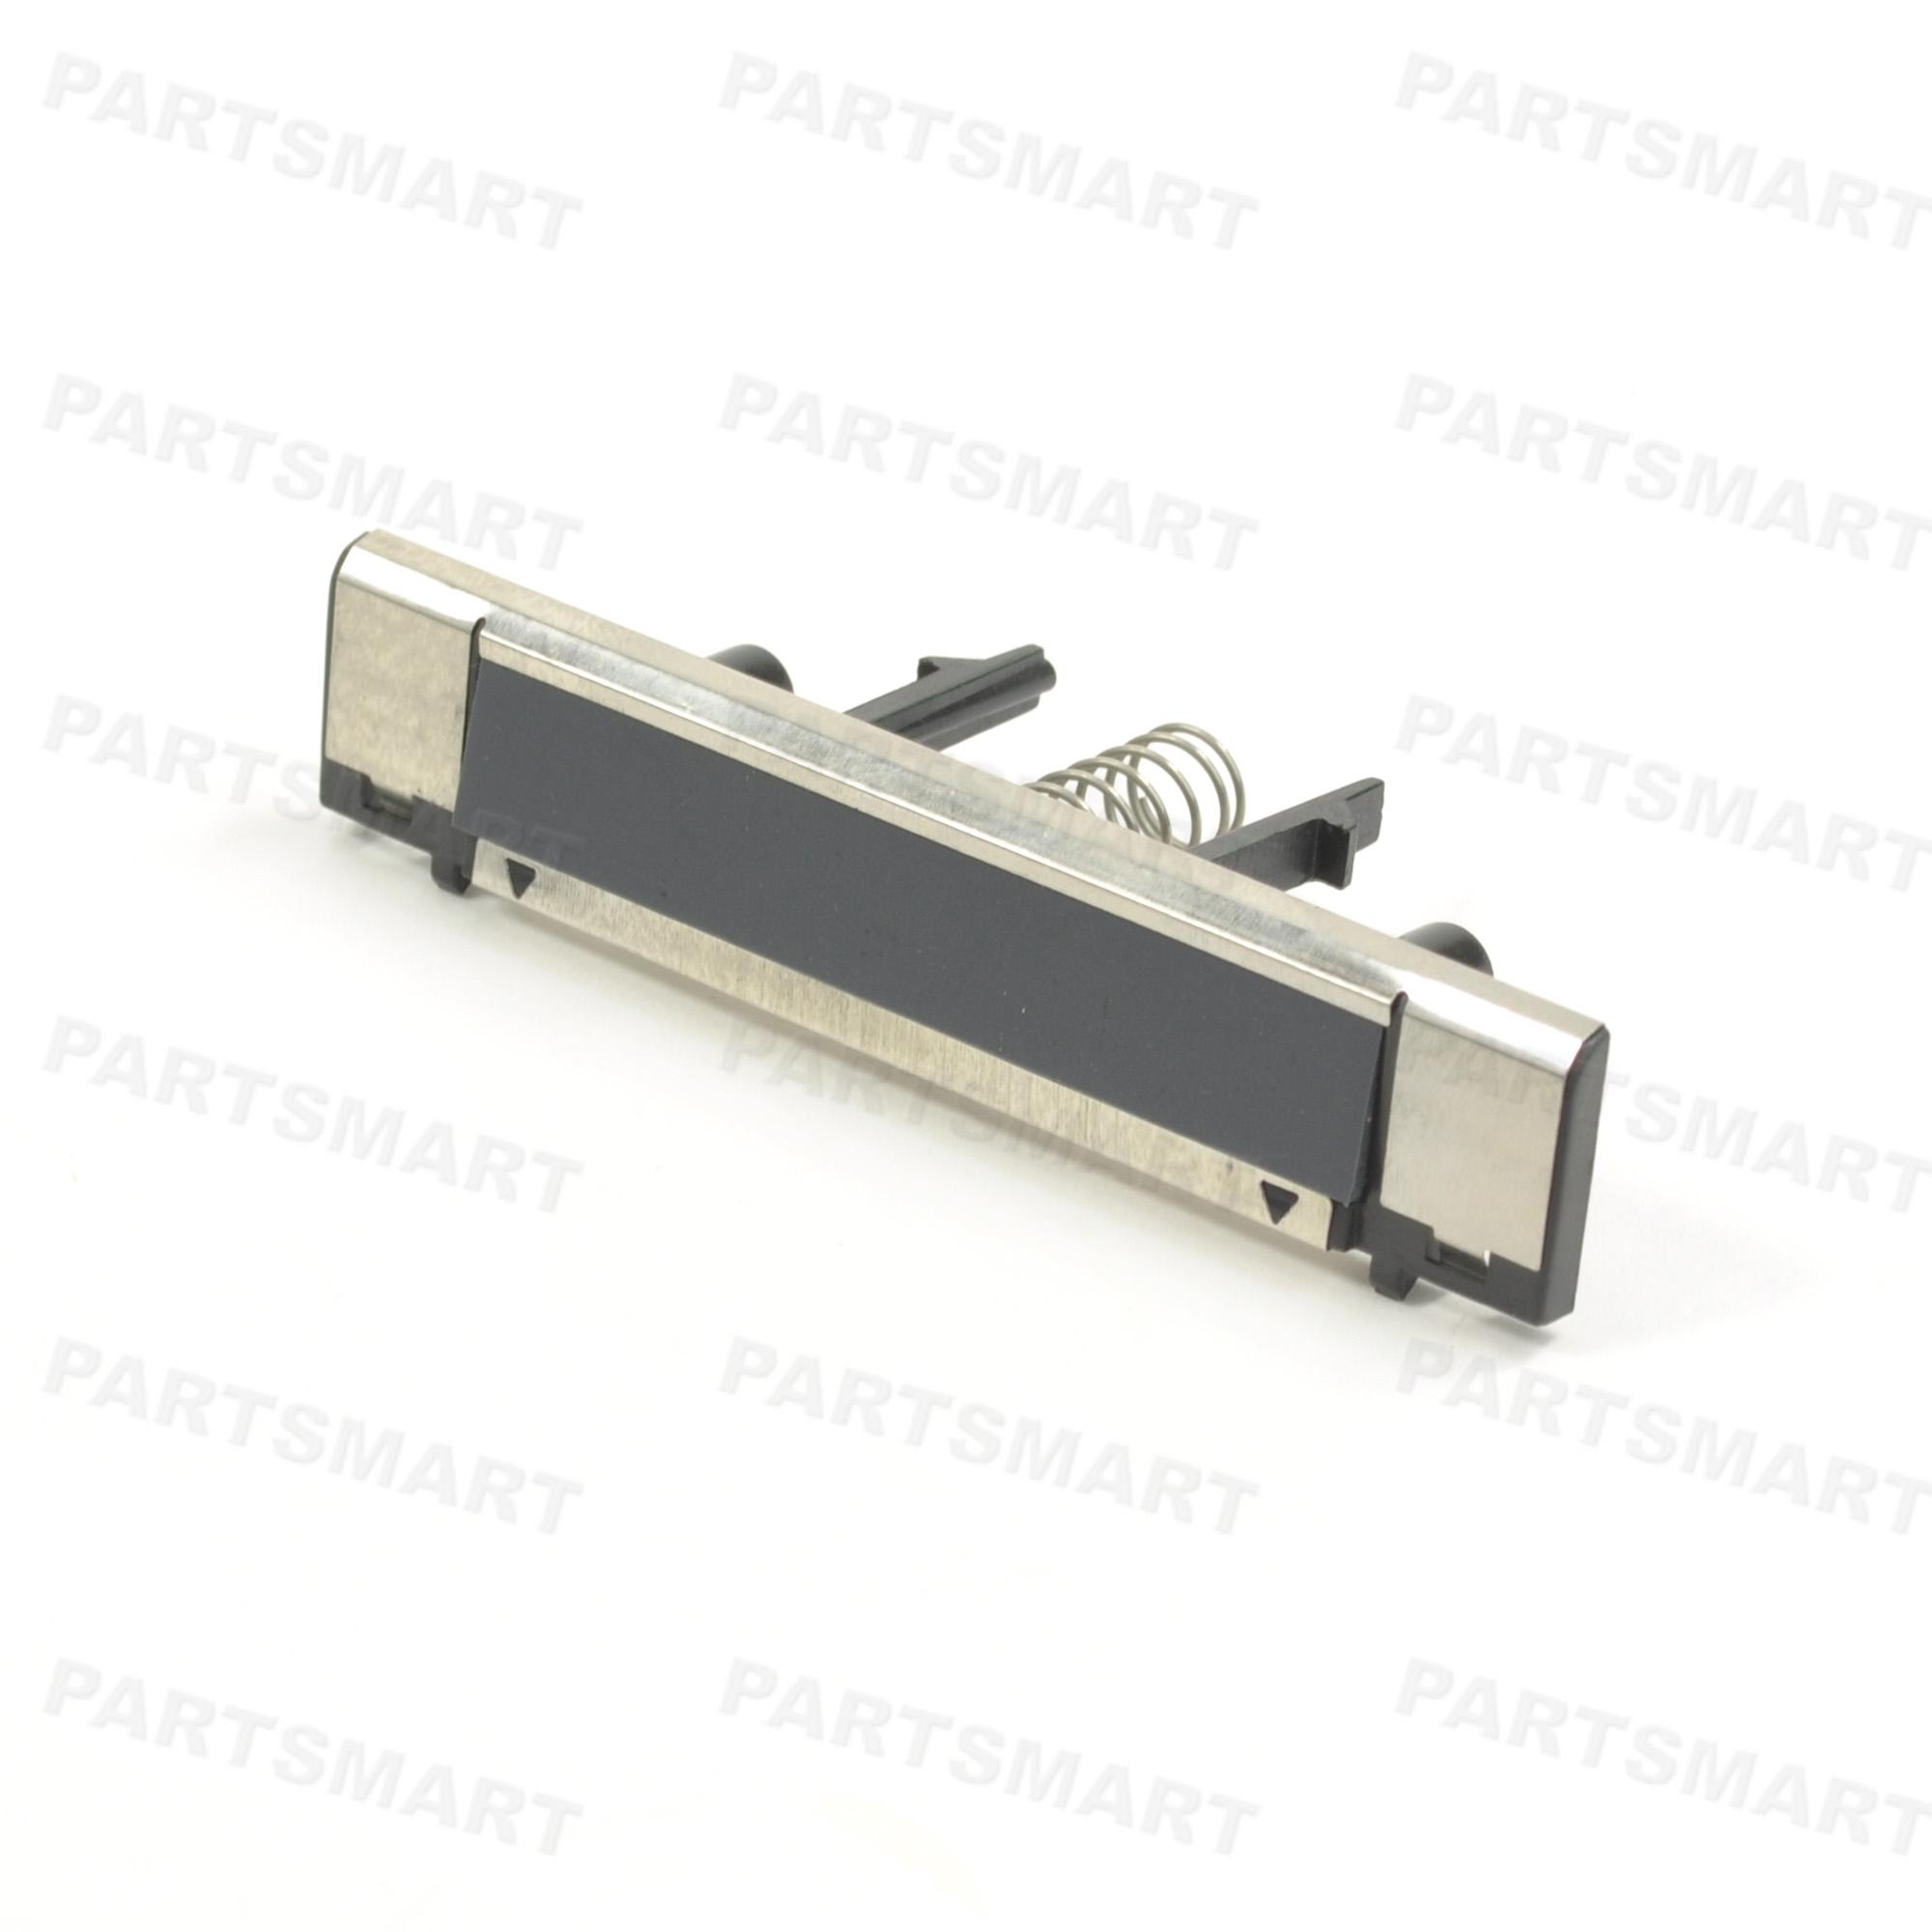 RF5-2435-000 See RG9-1485-000 for HP LaserJet 5000   Price: $2.93   Printer  Parts   Partsmart